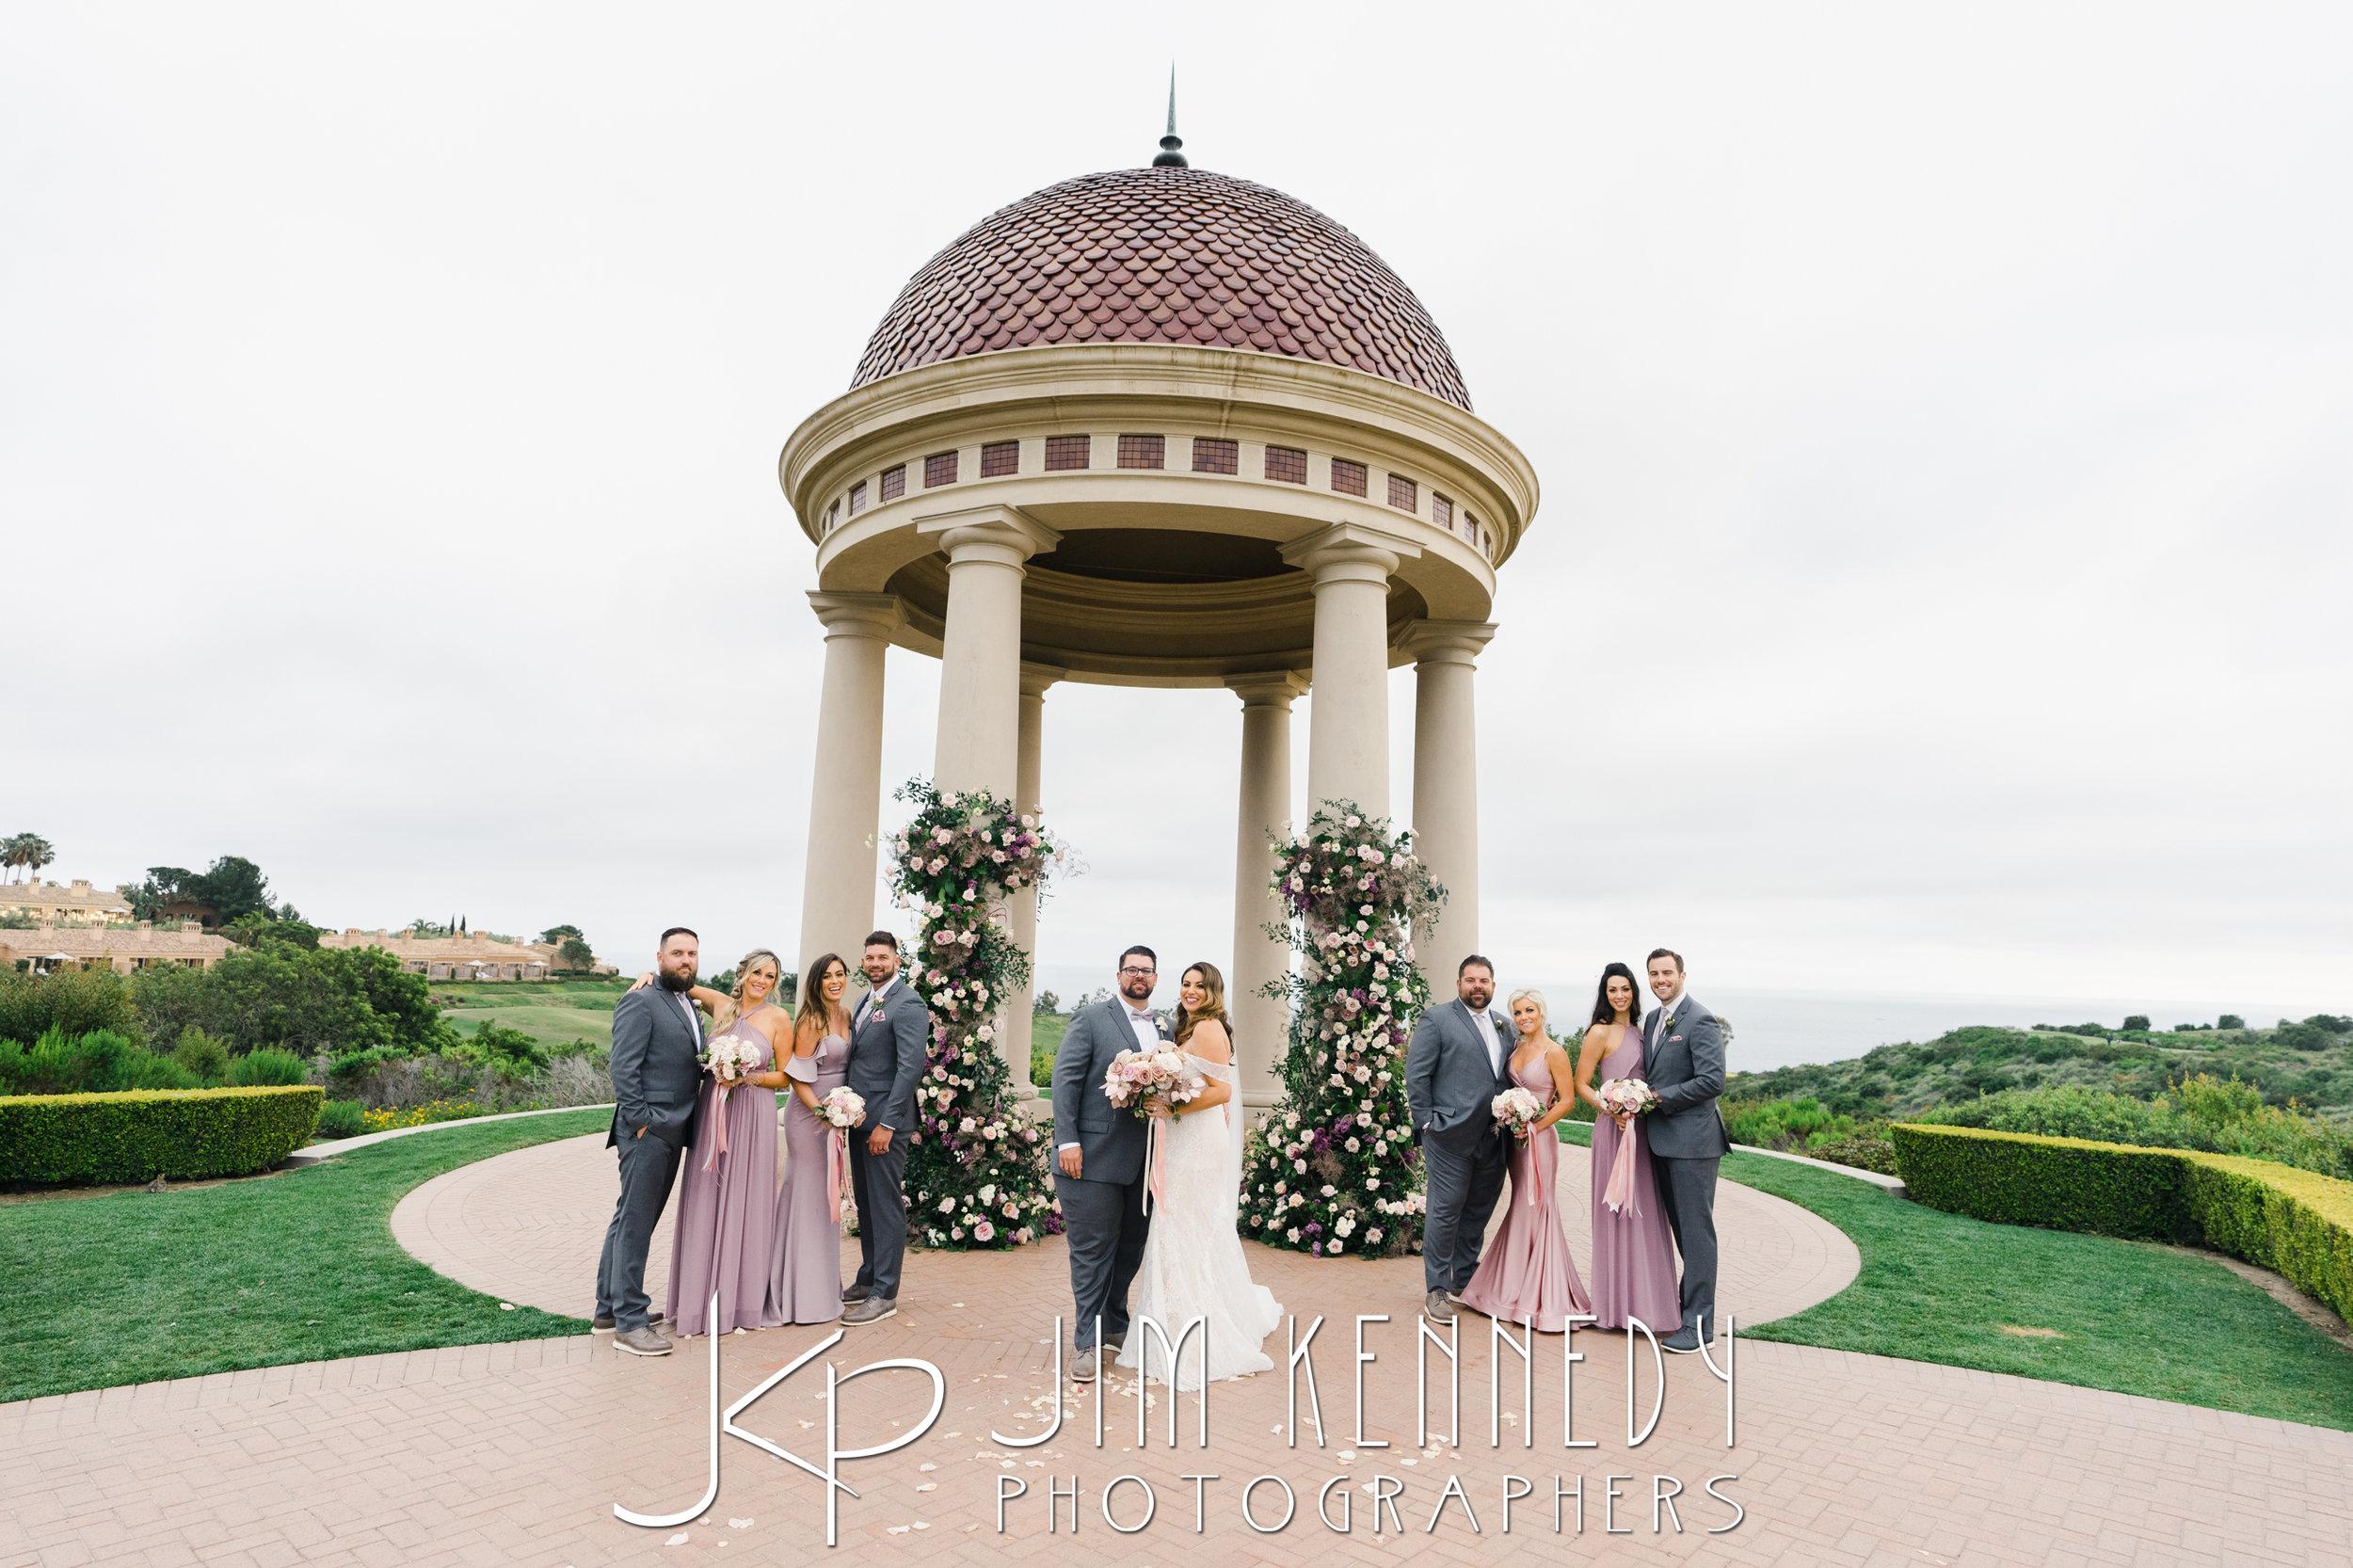 pelican-hill-wedding-jim-kenedy-photographers_0154.JPG